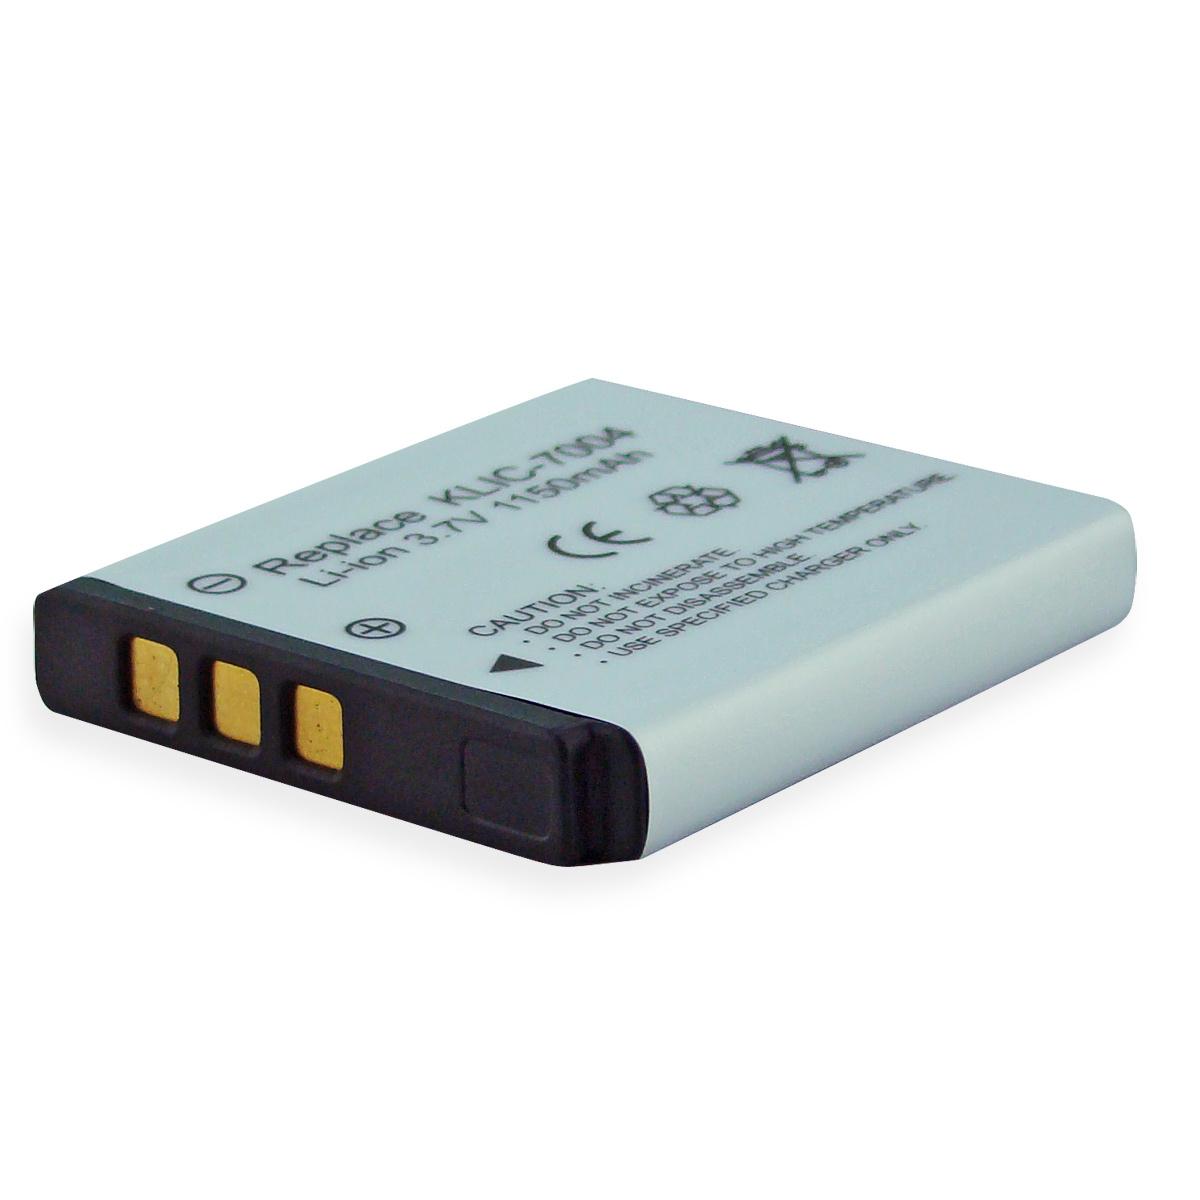 Denaq 1150mah Li-ion Camera/camcorder Battery For Kodak Easyshare V1233, V1253, V1273, M1033 - 1150 Mah - Lithium Ion [li-ion] (dq-rc7004-k)